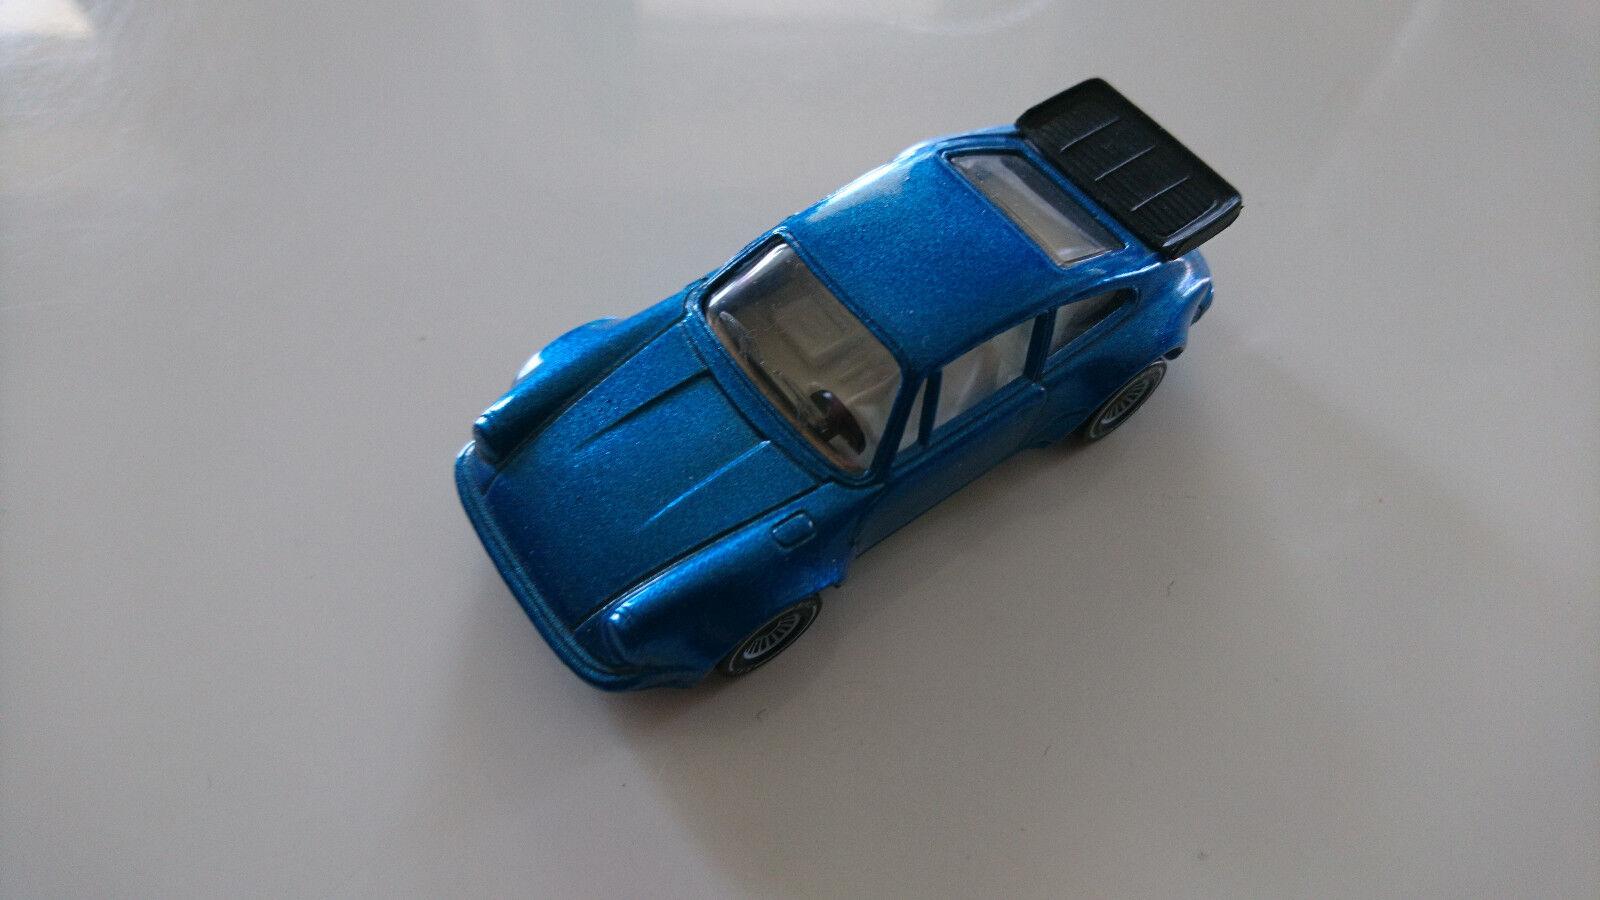 Siku Siku Siku 1059 Porsche 911 Turbo bleumet. b4 Comme neuf 12d75c